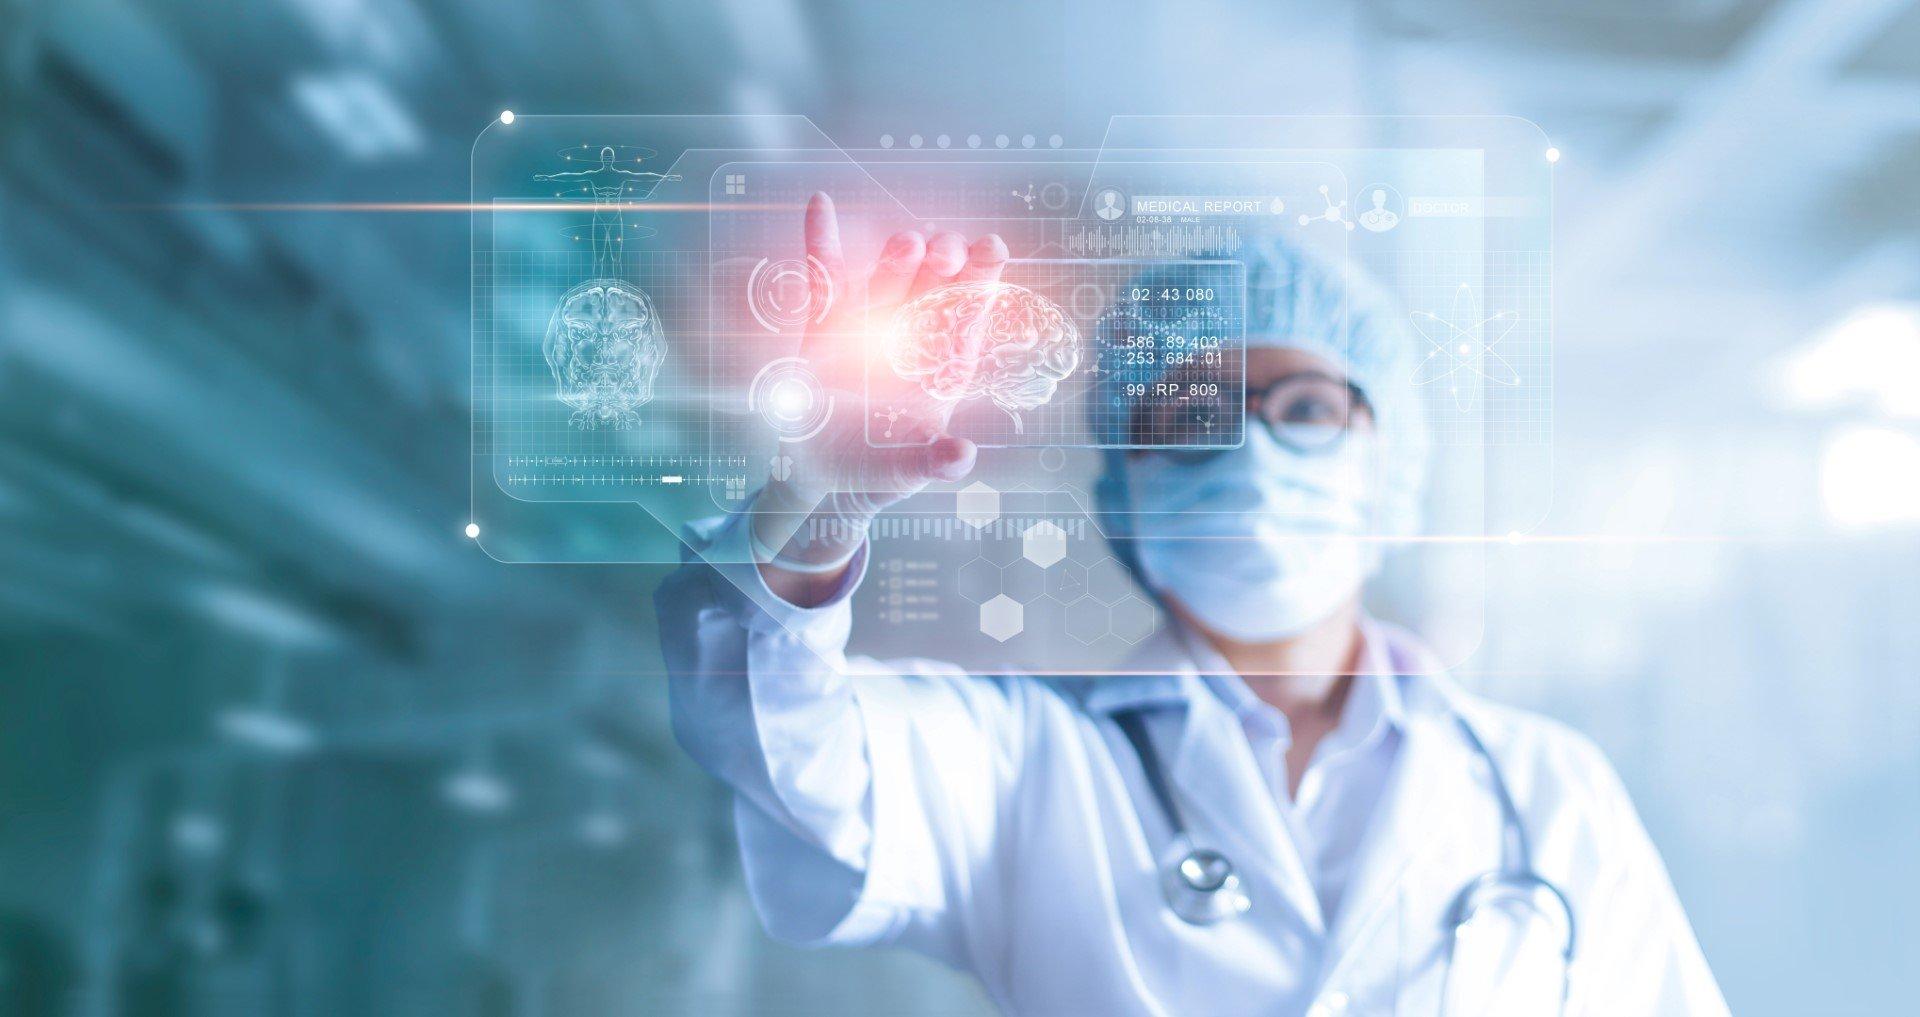 EU Medical Device Regulation and EU General Data Protection Regulation intersection